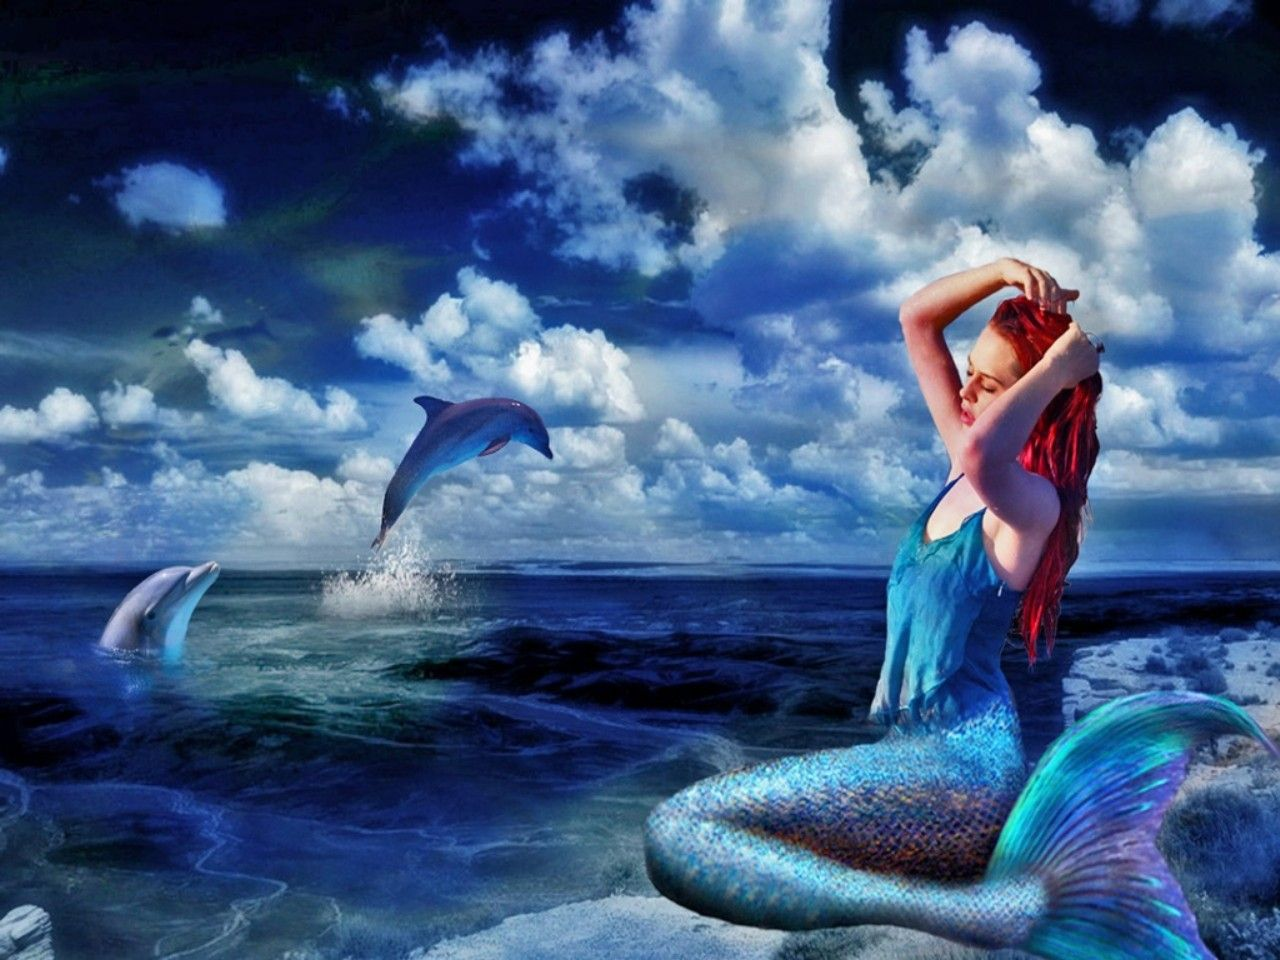 Images Of Mermaids